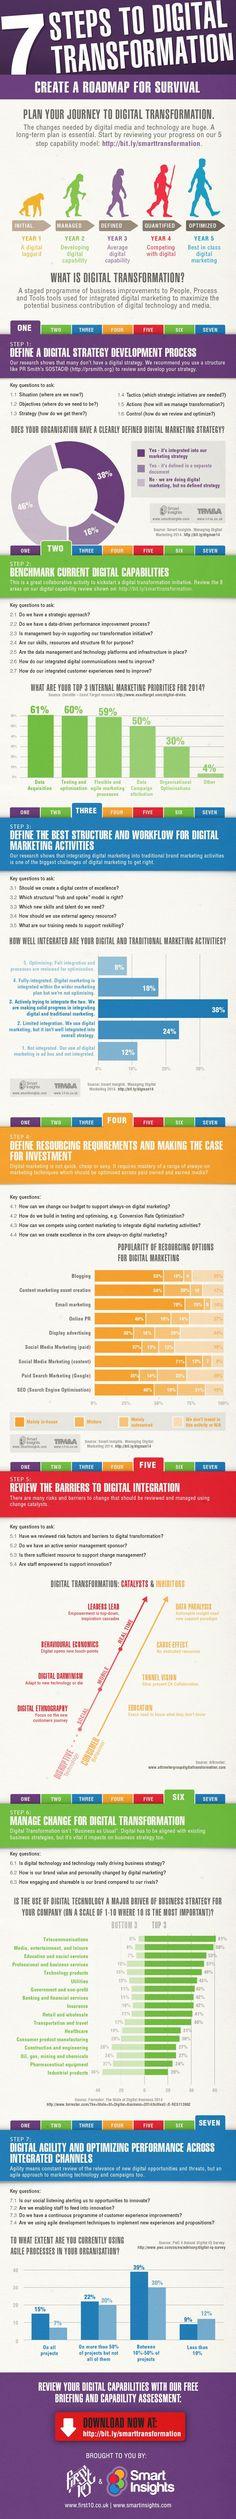 7 Steps to Digital Transformation - #infographic #digitalmarketing. How far advanced are you?